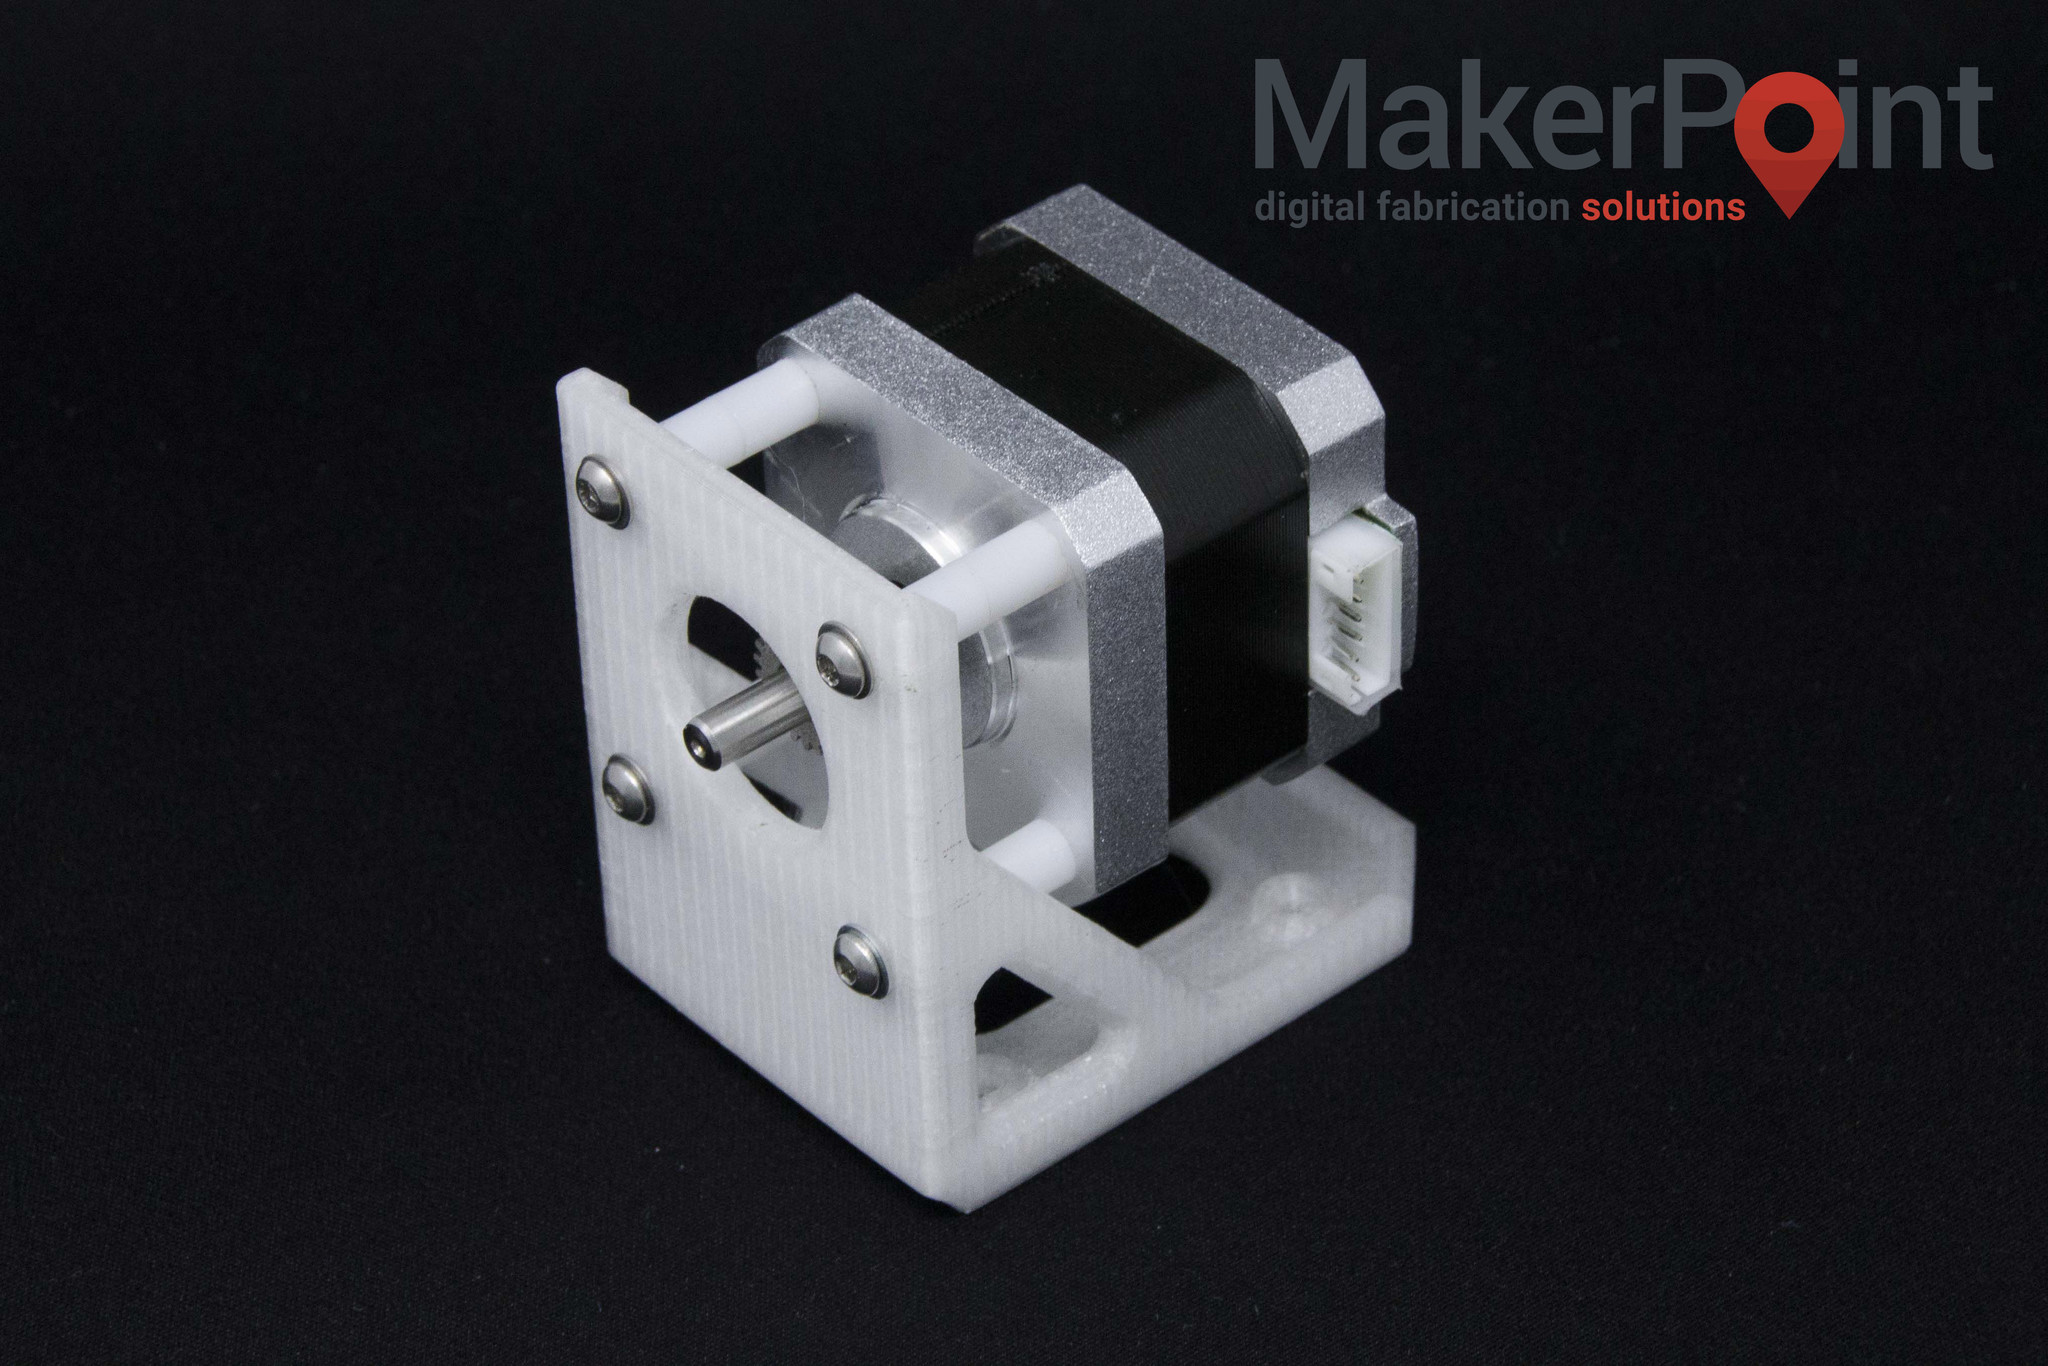 Material highlight: Mitsubishi Durabio, Bio-Based filament met eigenschappen van PC en PMMA